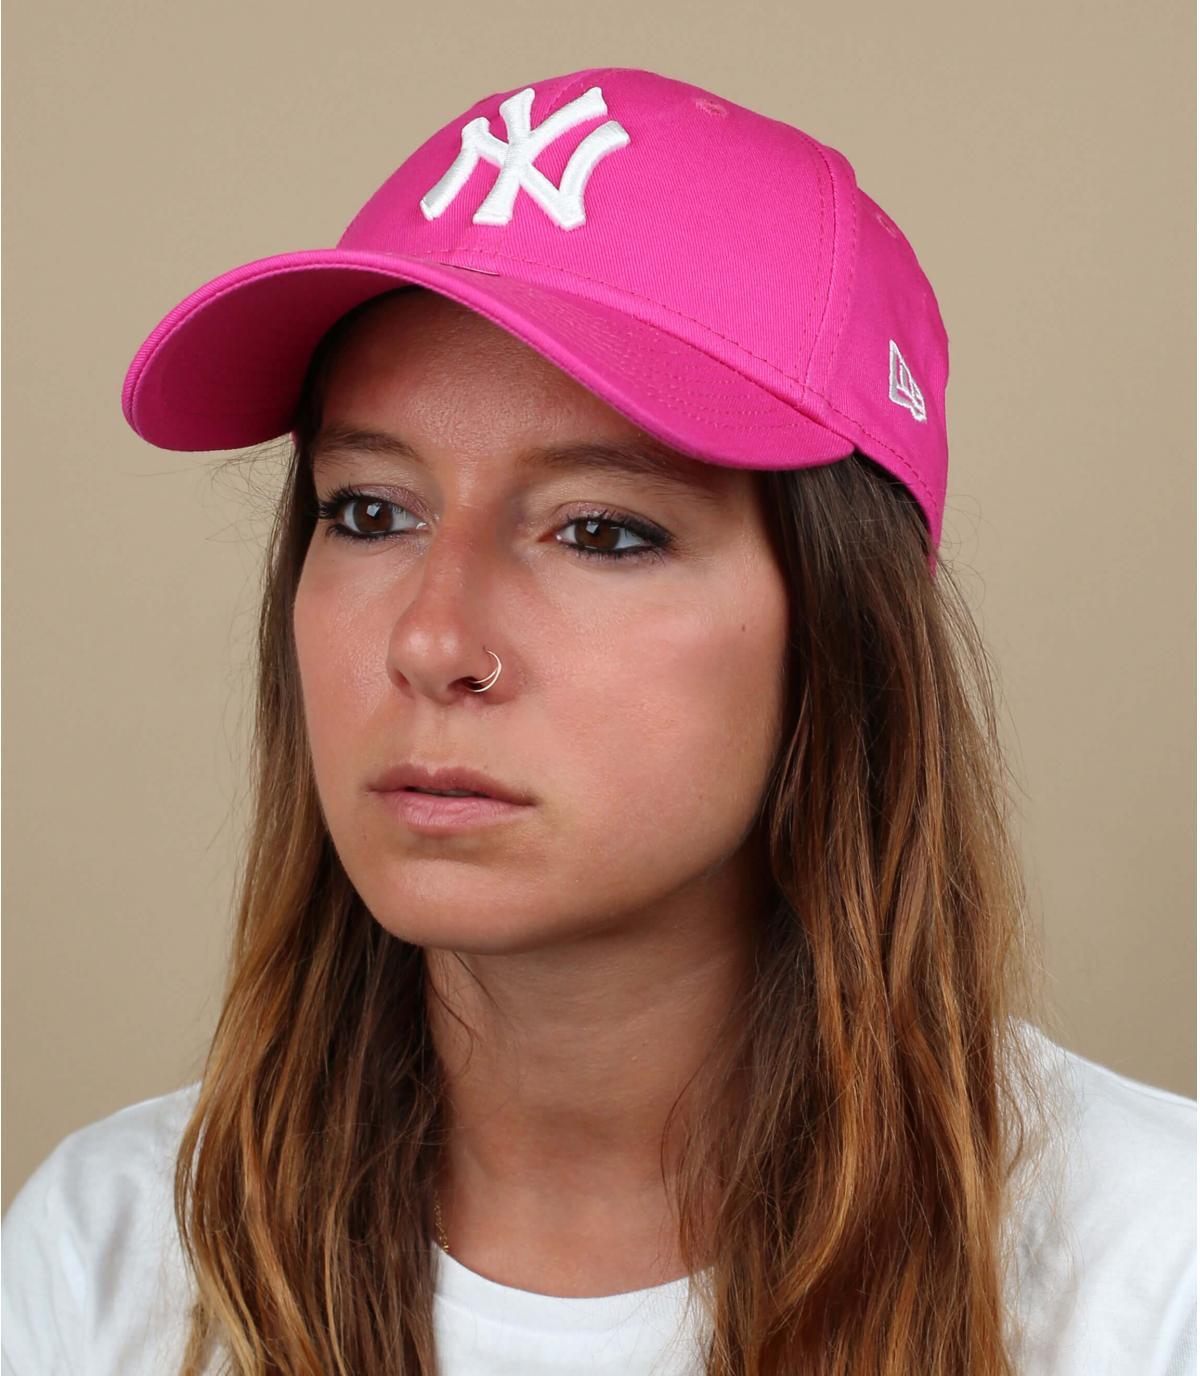 Pink curved visor cap